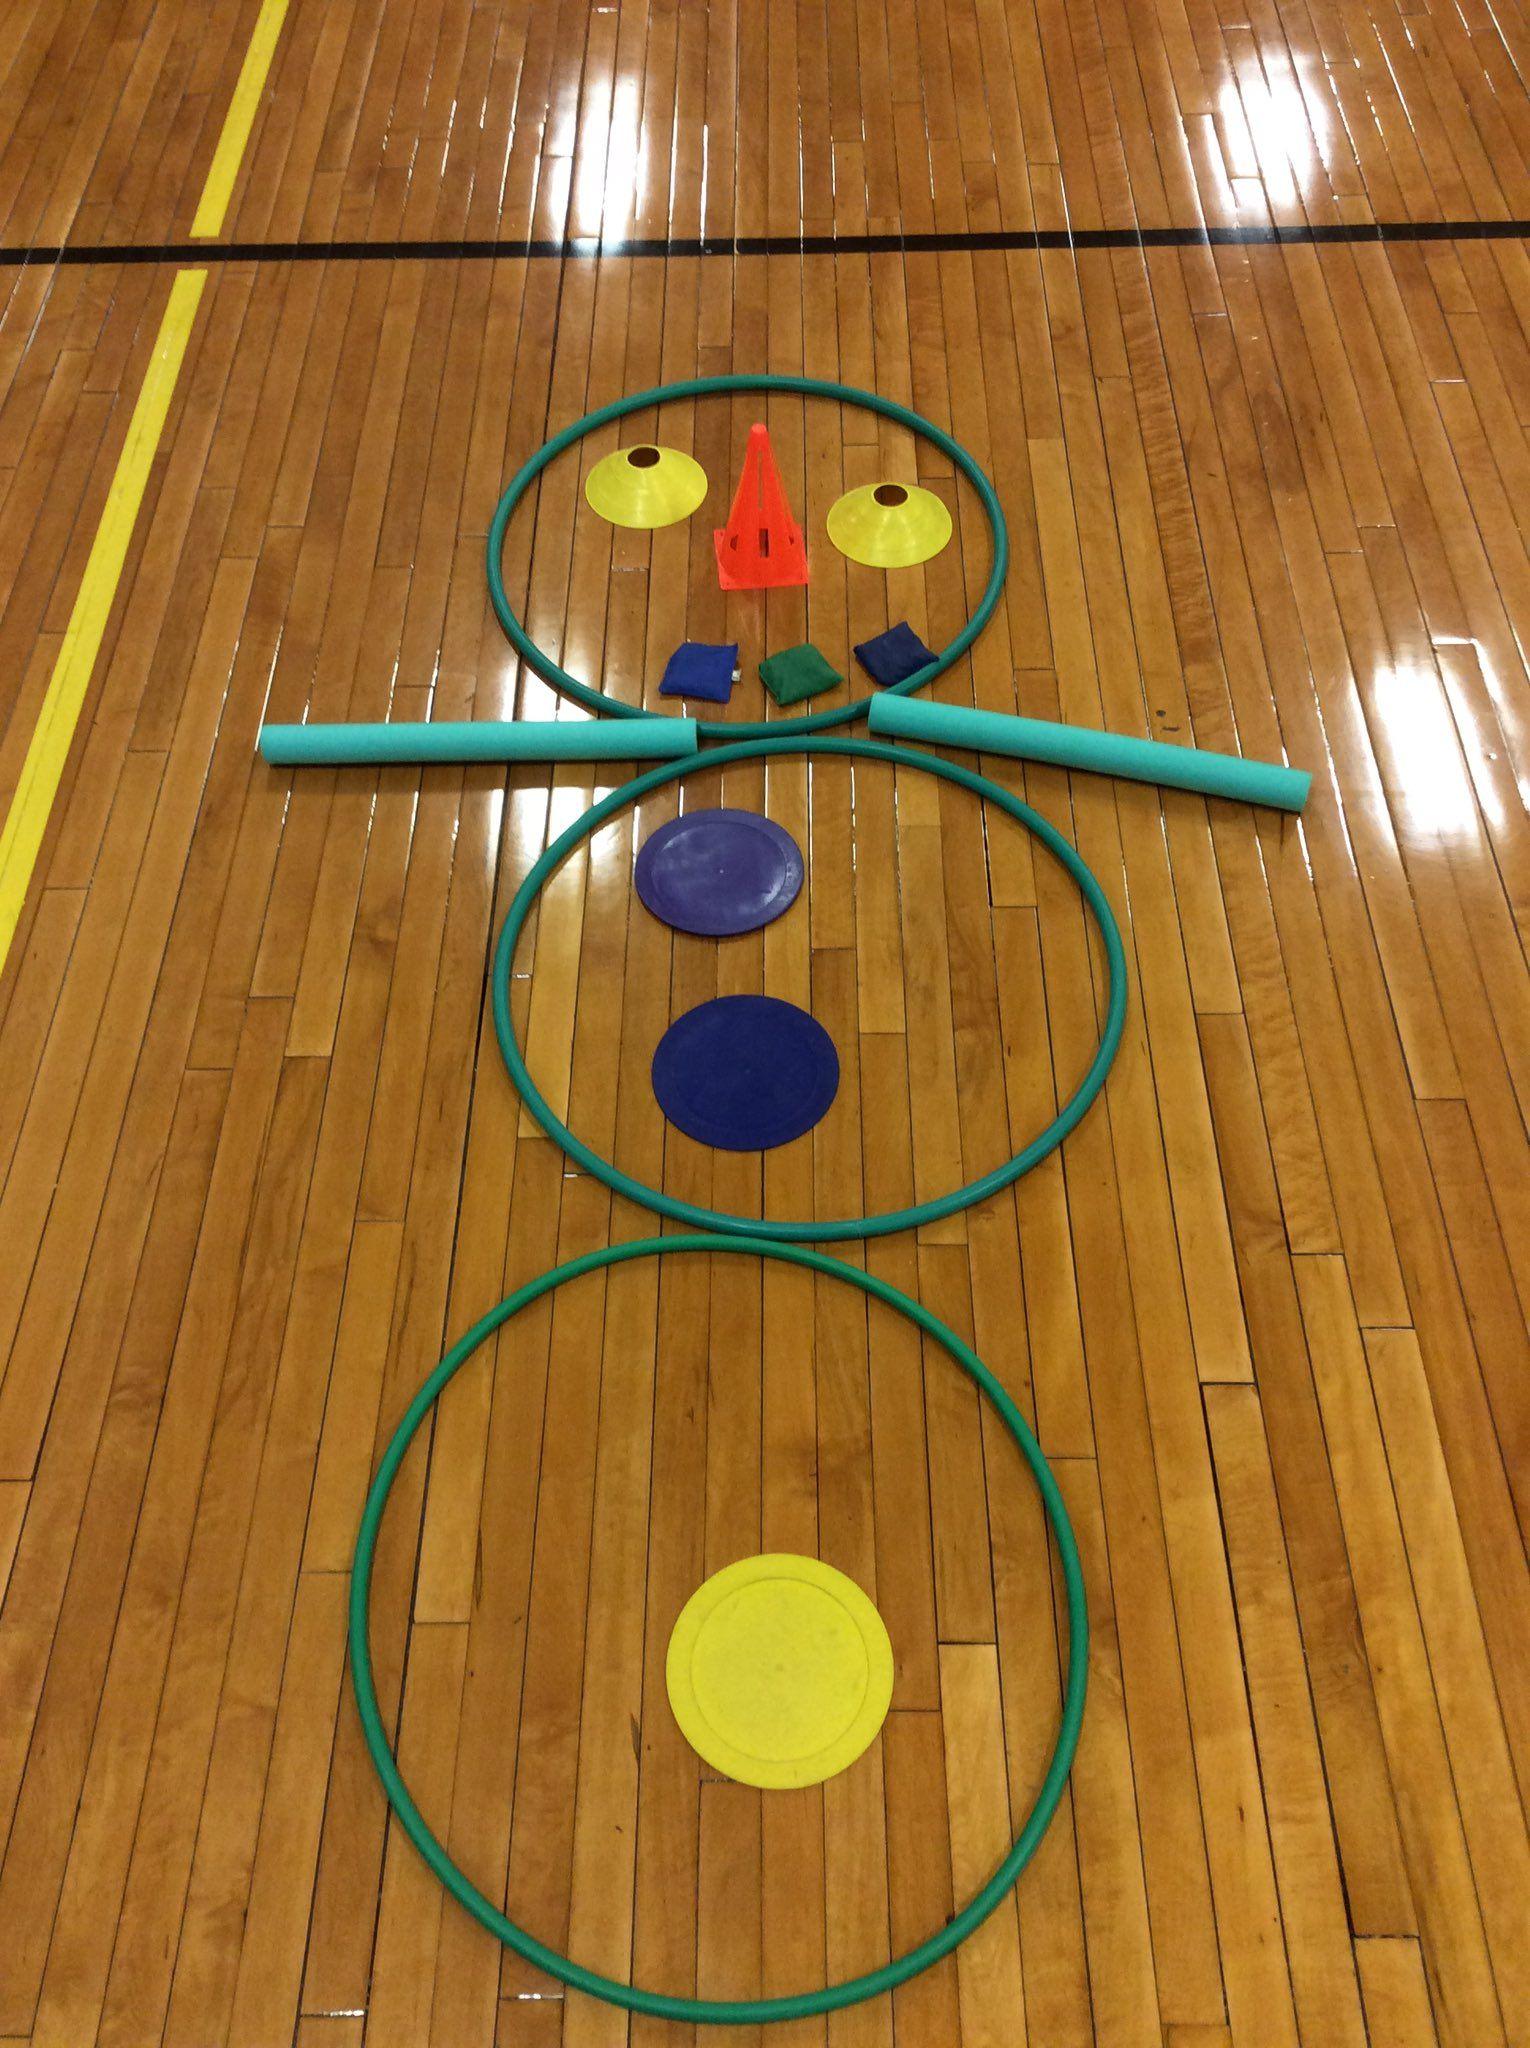 Drew Burris on Pe games elementary, Physical education